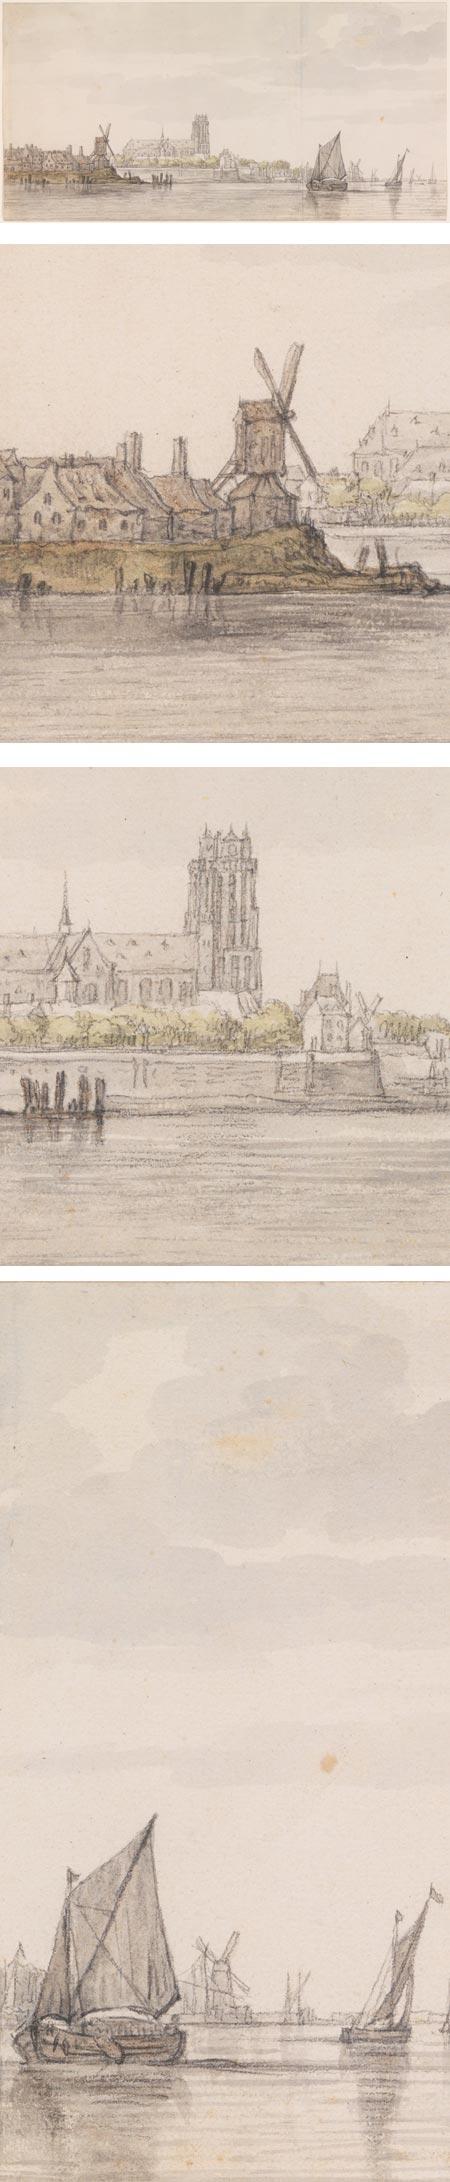 View of the Groote Kerk in Dordrecht from the River Maas, Aelbert Cuyp